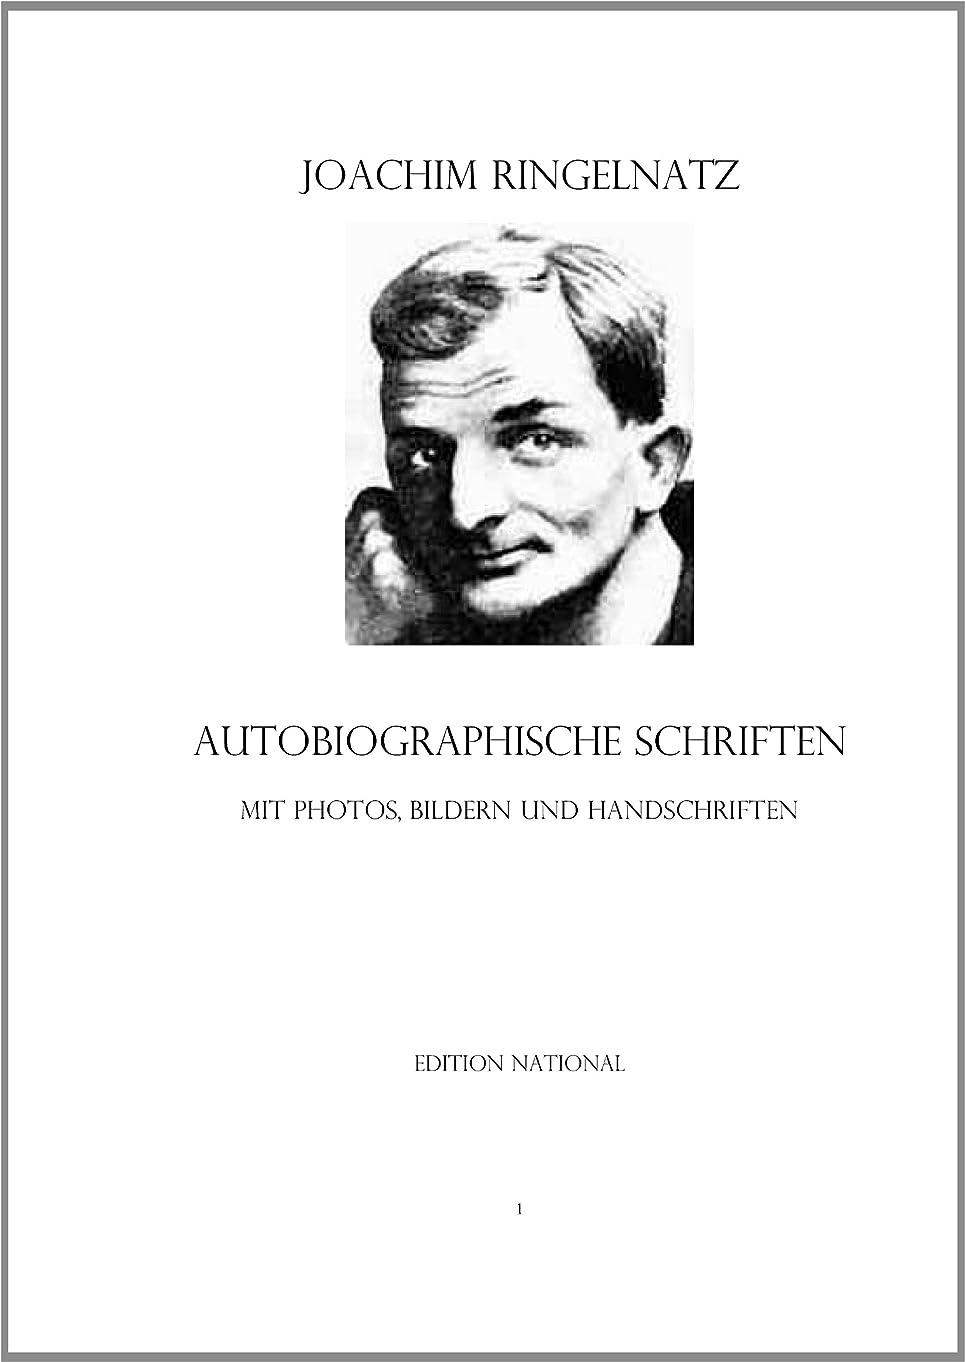 混乱担保破滅的なAutobiographische Schriften Mit Photos, Bildern und Handschriften (German Edition)